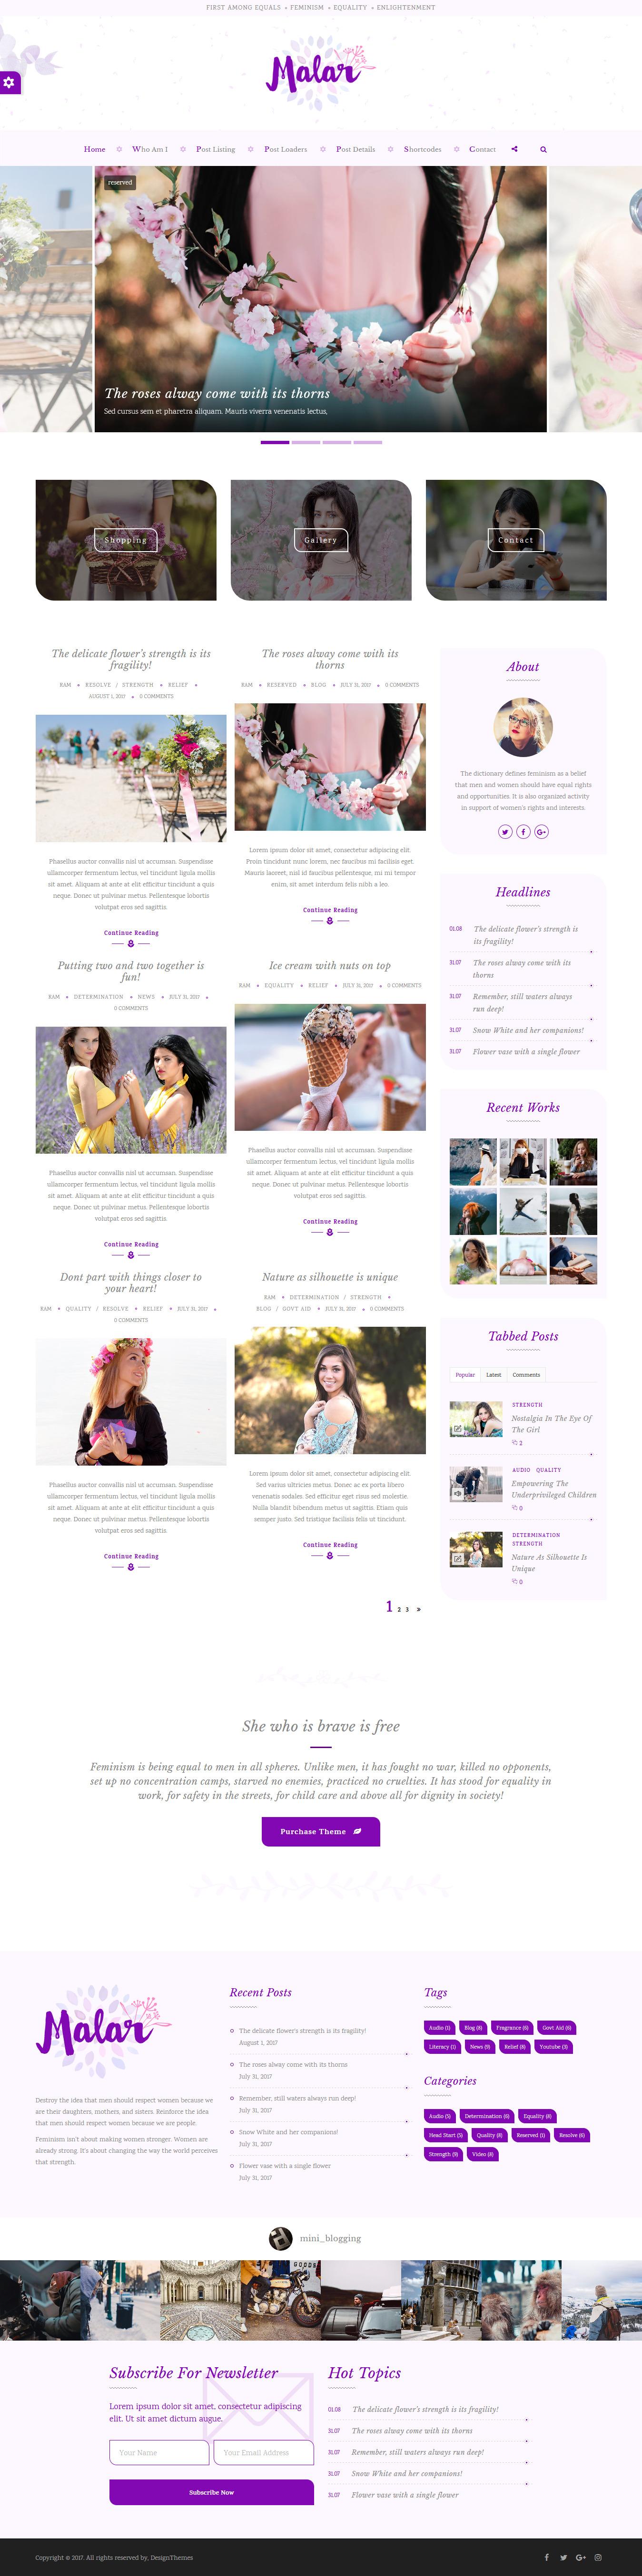 malar best premium feminine wordpress theme - 10+ Best Feminine WordPress Themes (Premium Version)